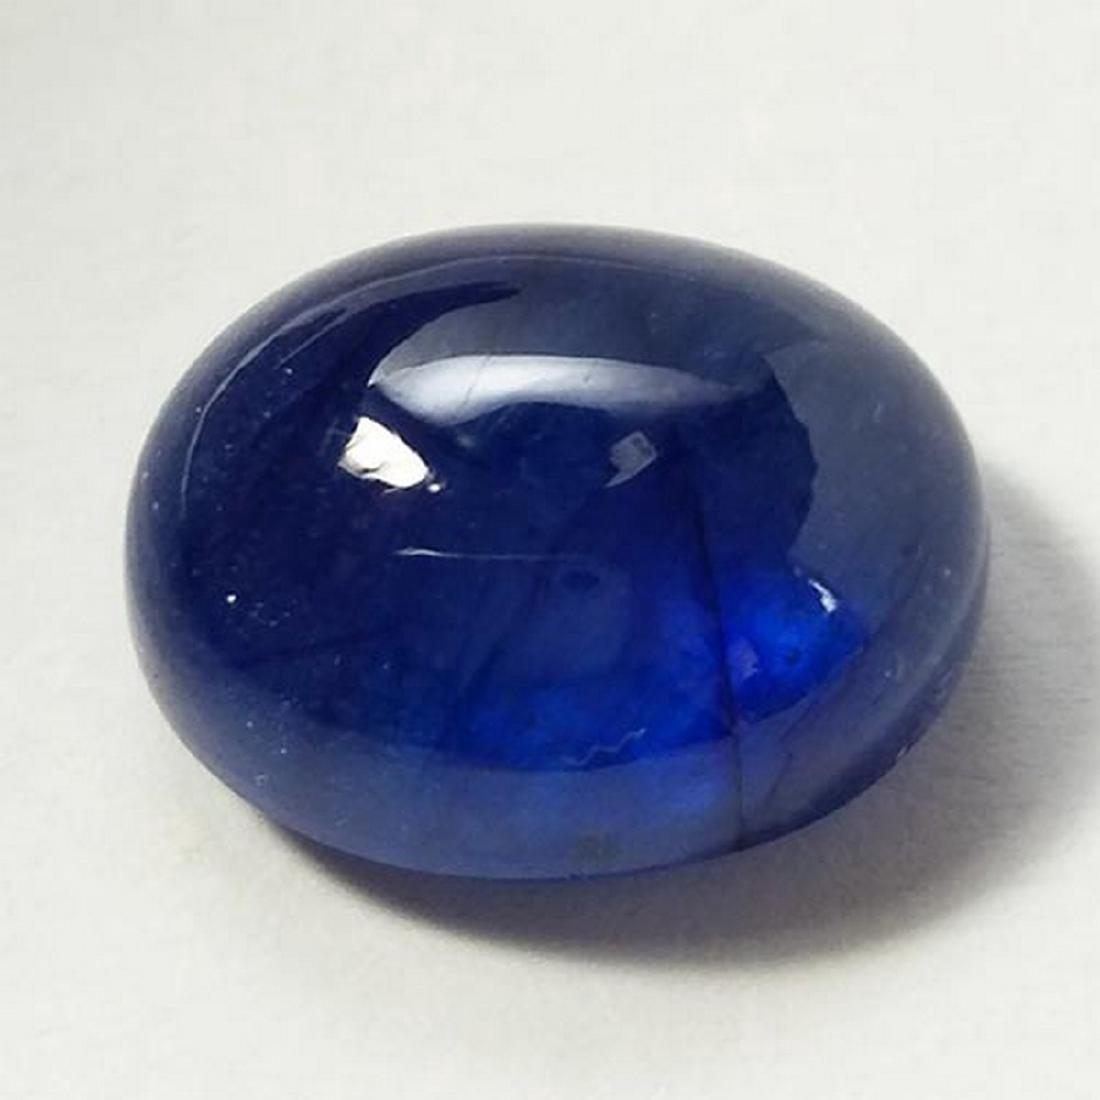 12.30 Carat Loose Blue Madagasgar Sapphire Cabochon - 4